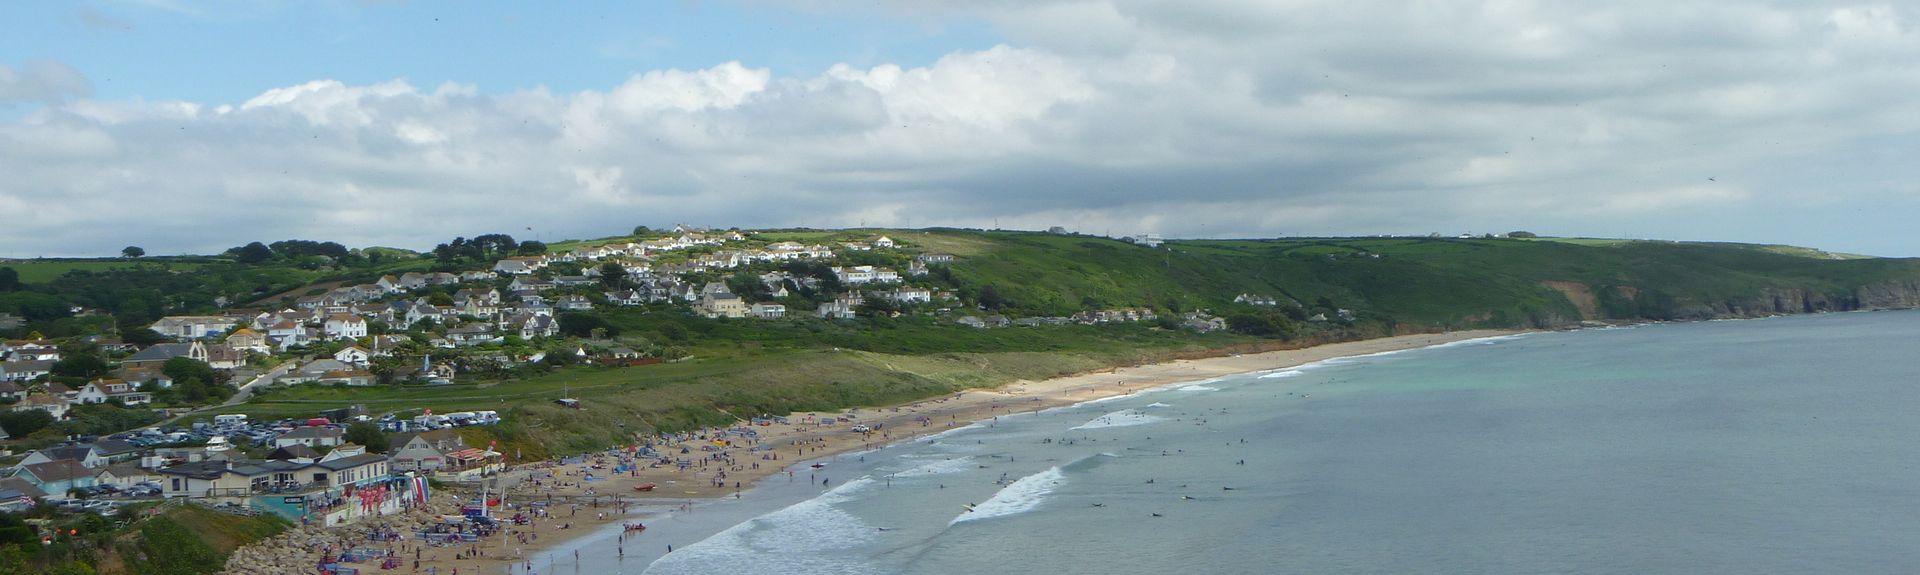 Porthleven Beach (ranta), Englanti, Yhdistynyt Kuningaskunta